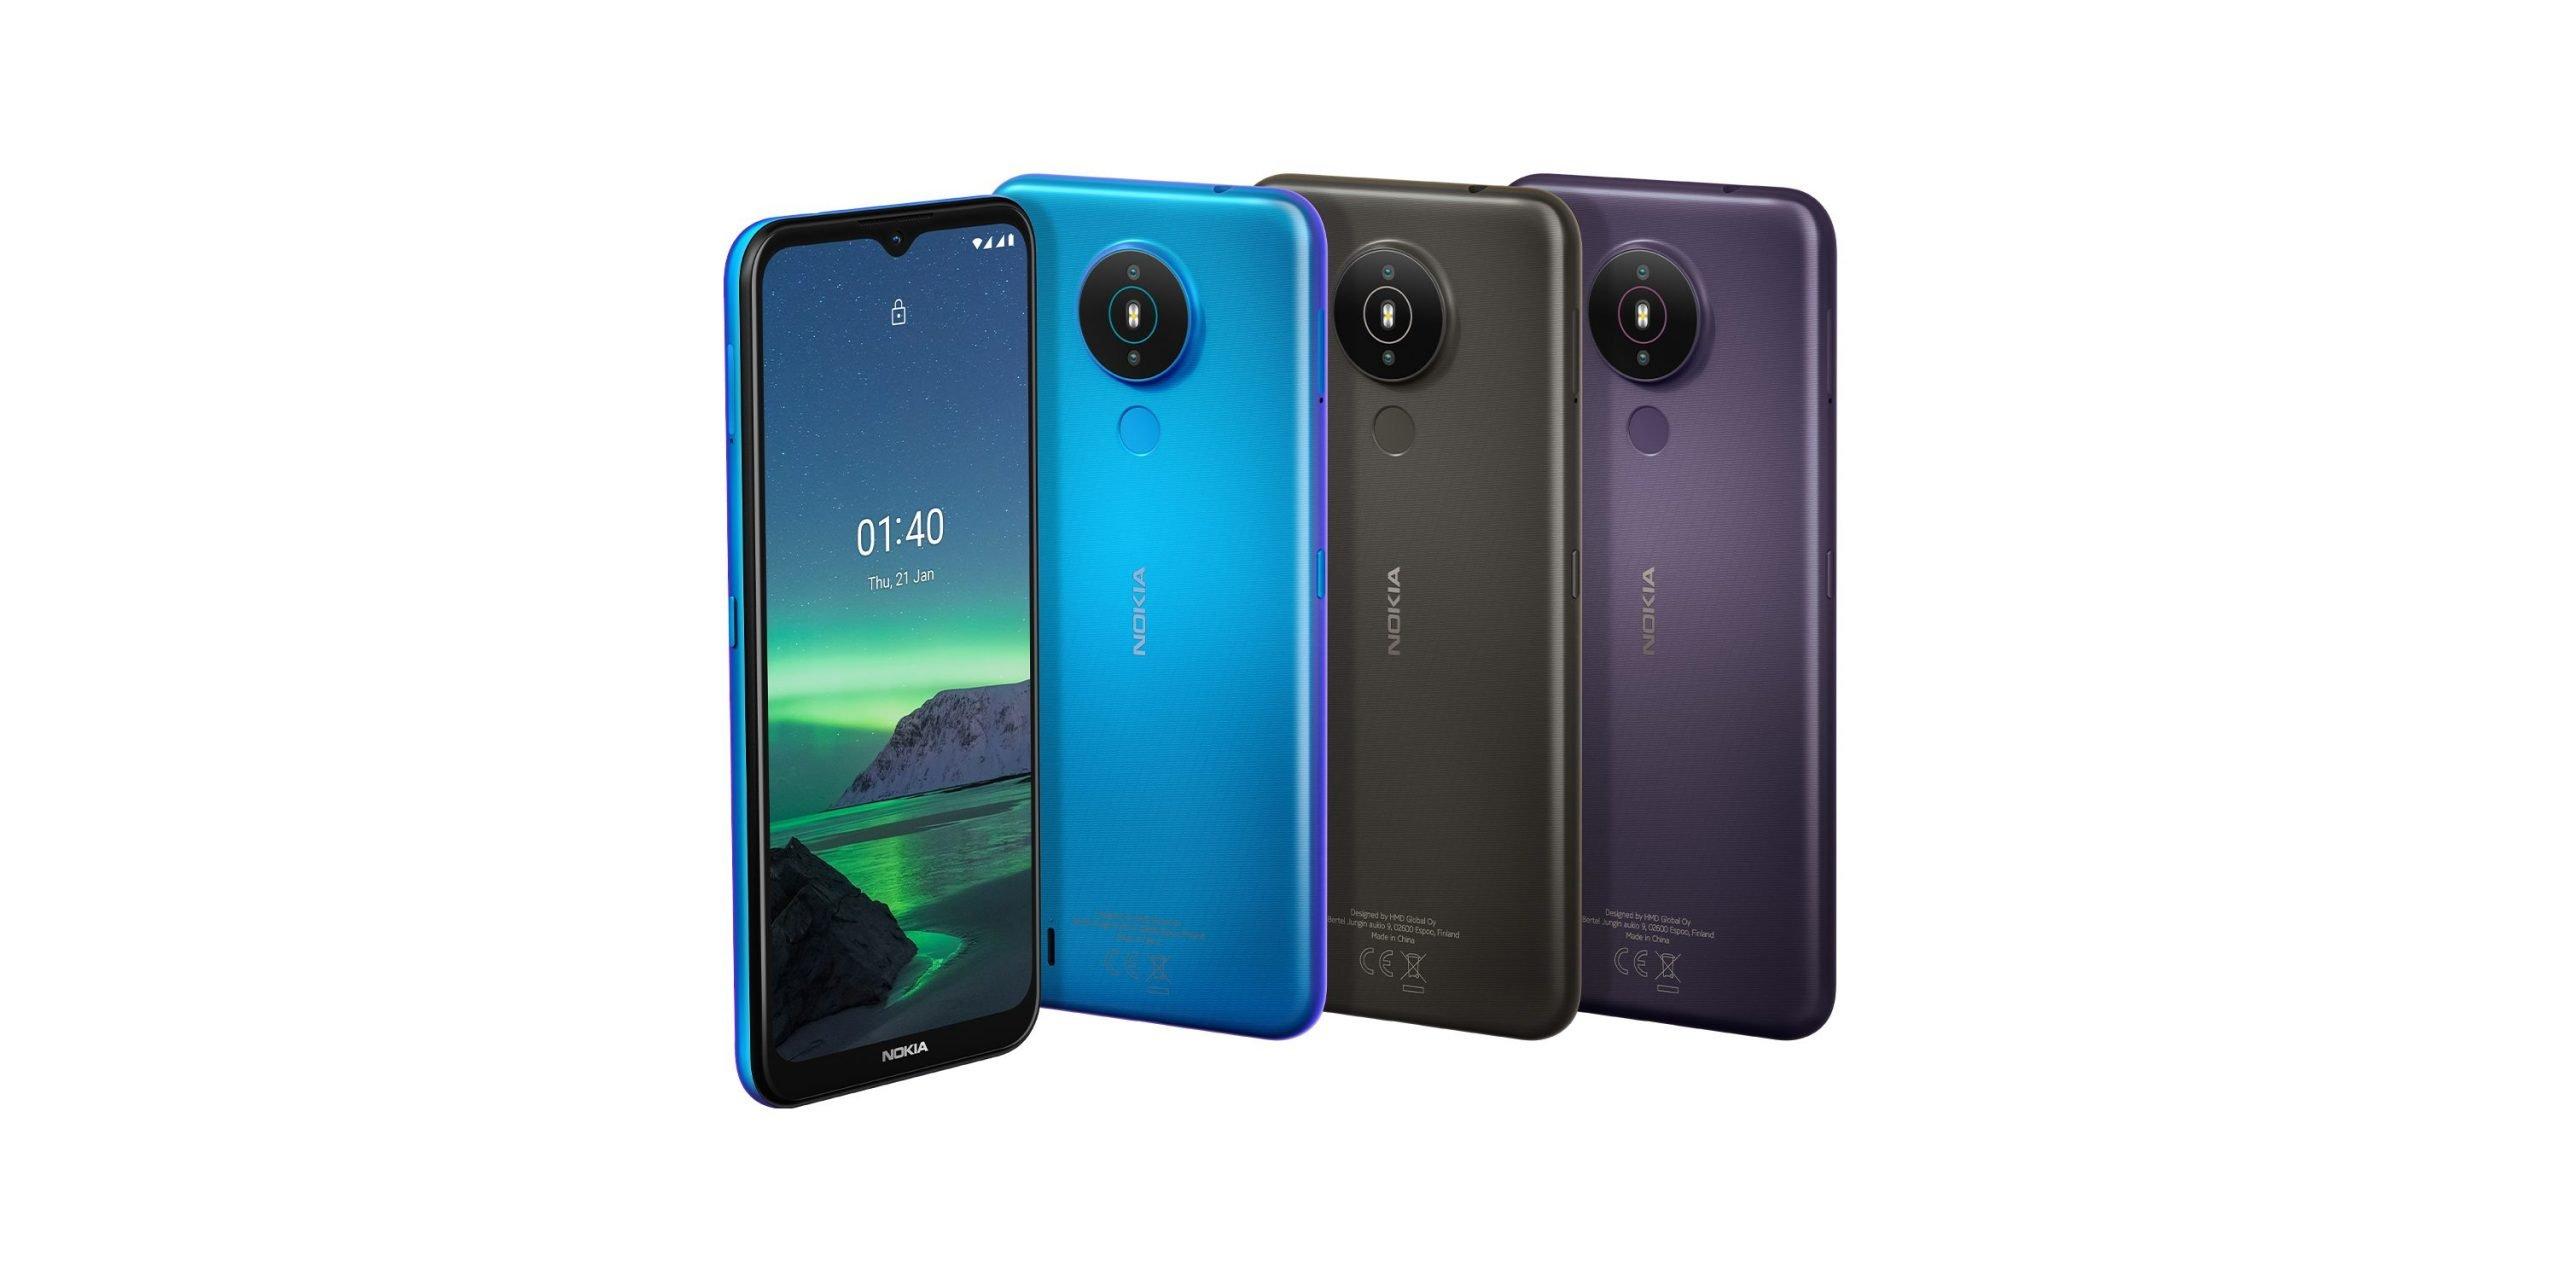 Nokia-1.4-faqs